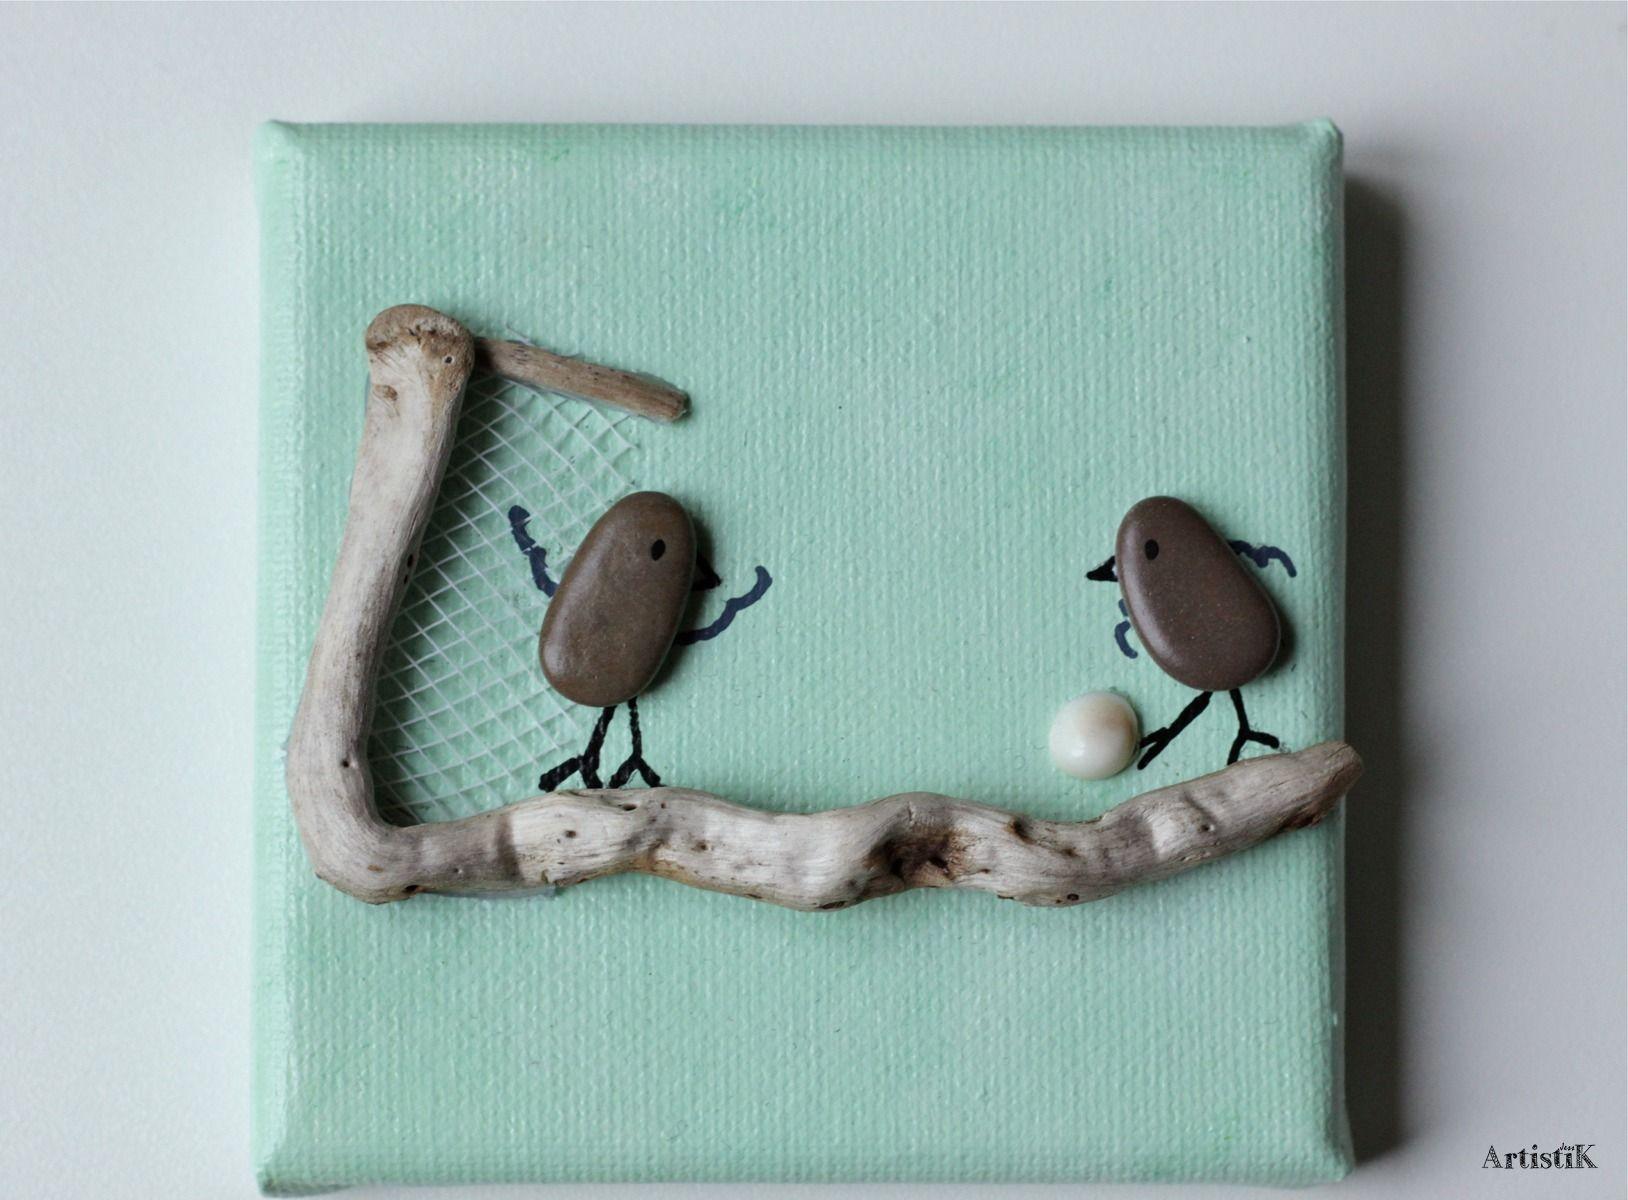 tableau galets oiseaux bois flott fond vert eau foot. Black Bedroom Furniture Sets. Home Design Ideas